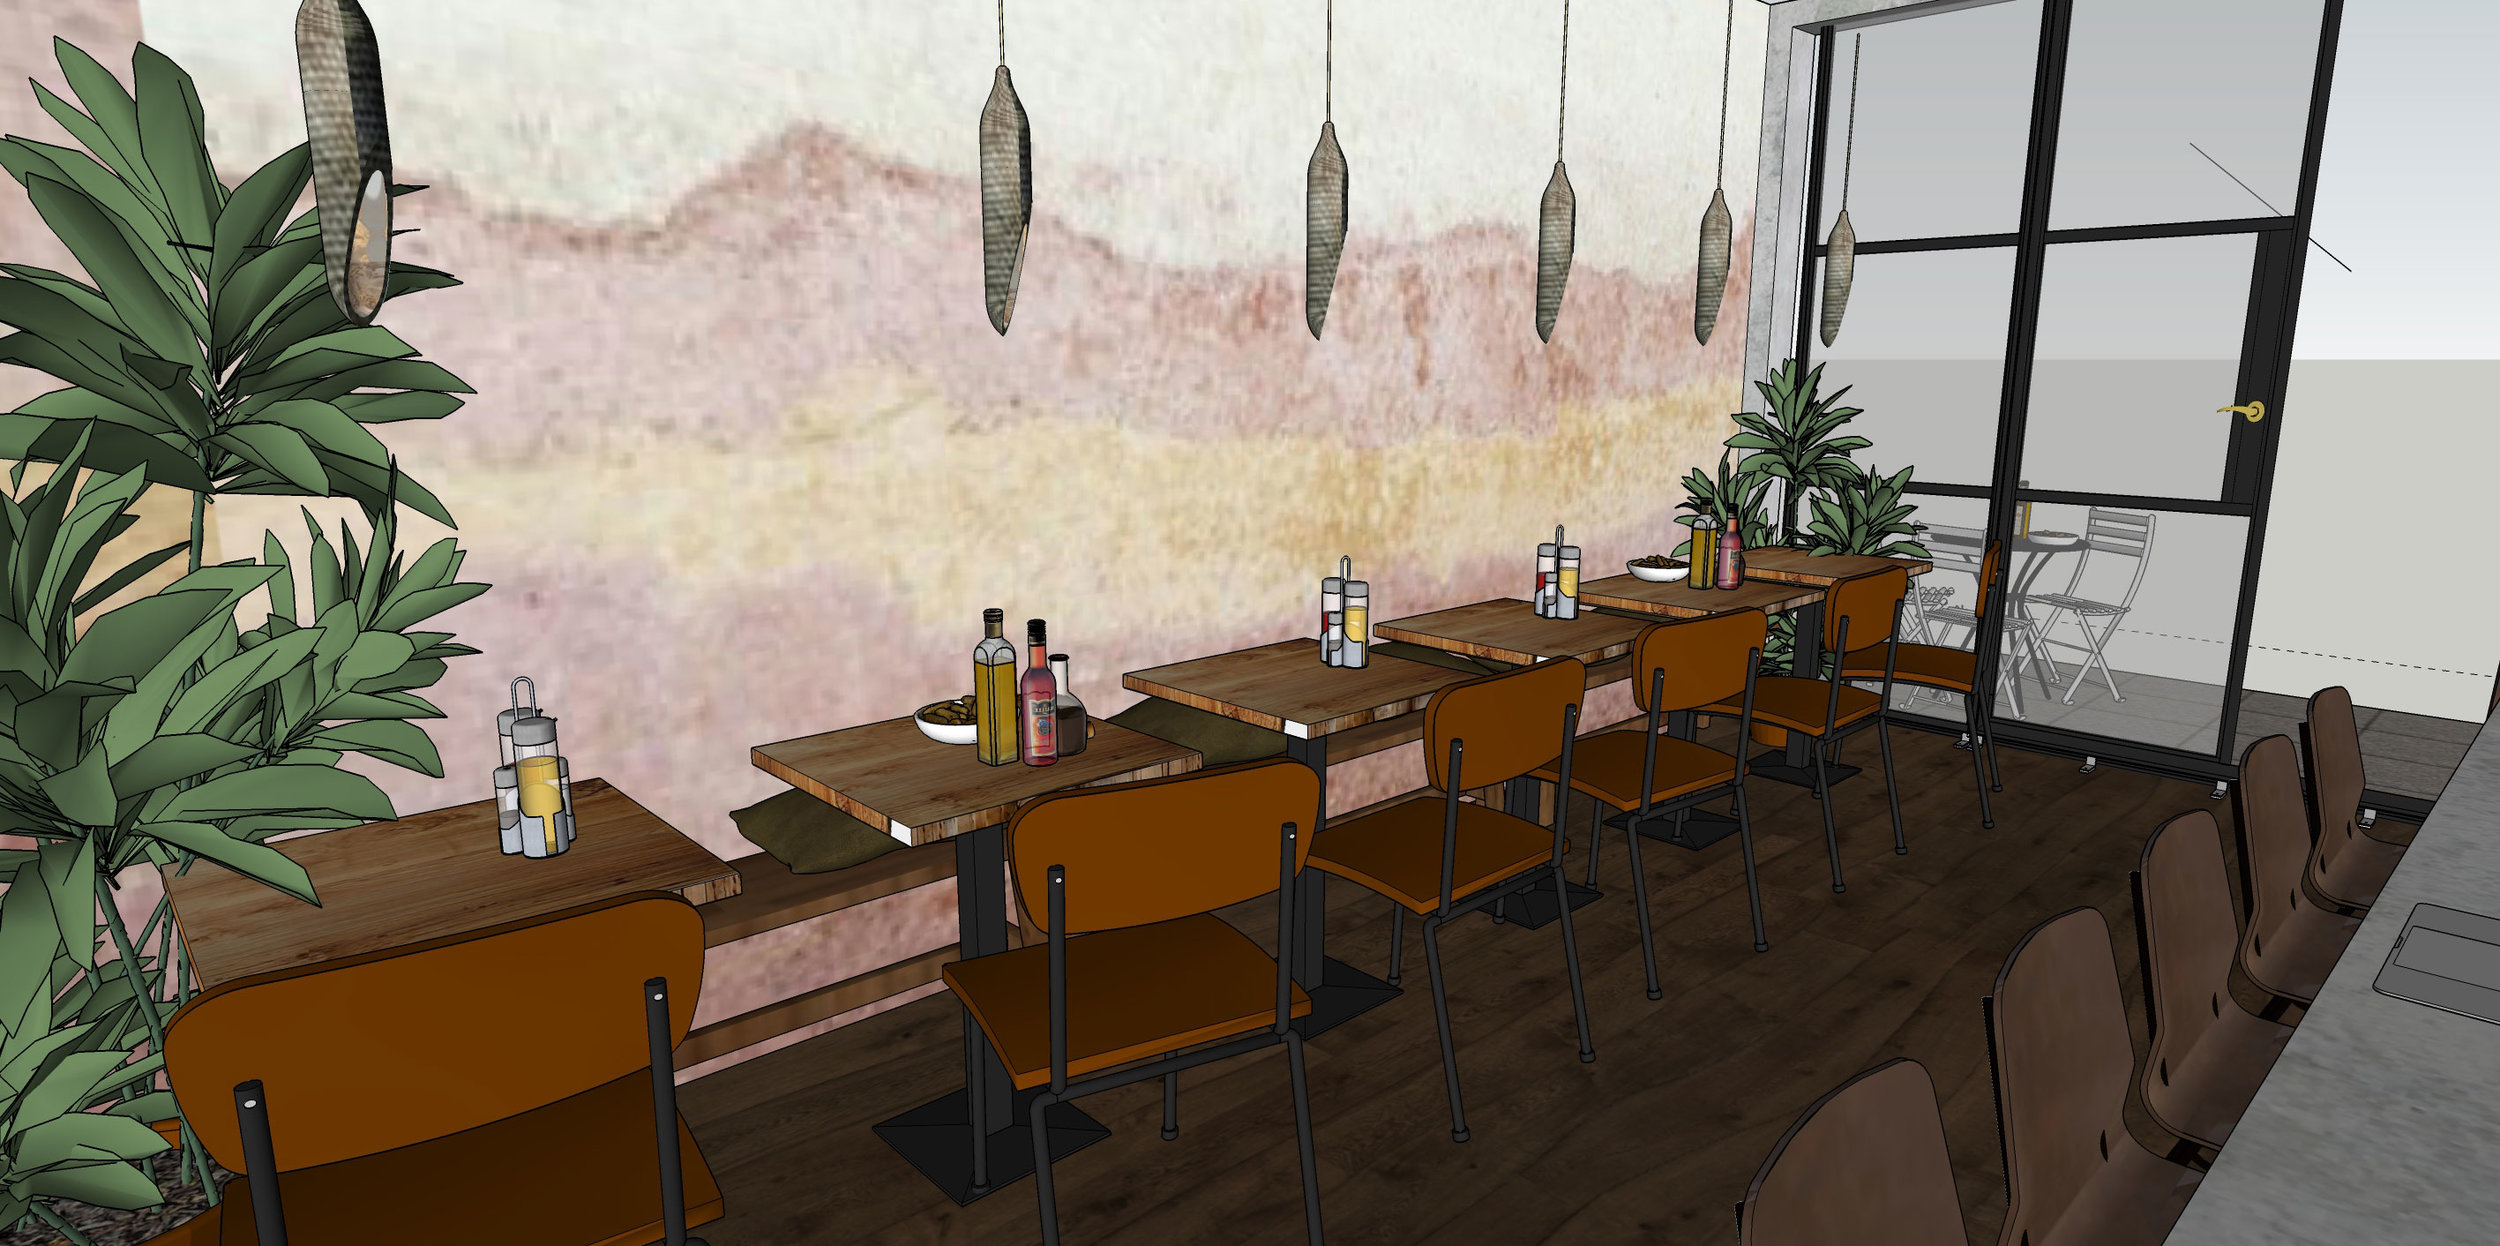 StudioNoun-InteriorDesignProject-Restaurant-Soil_3.jpg